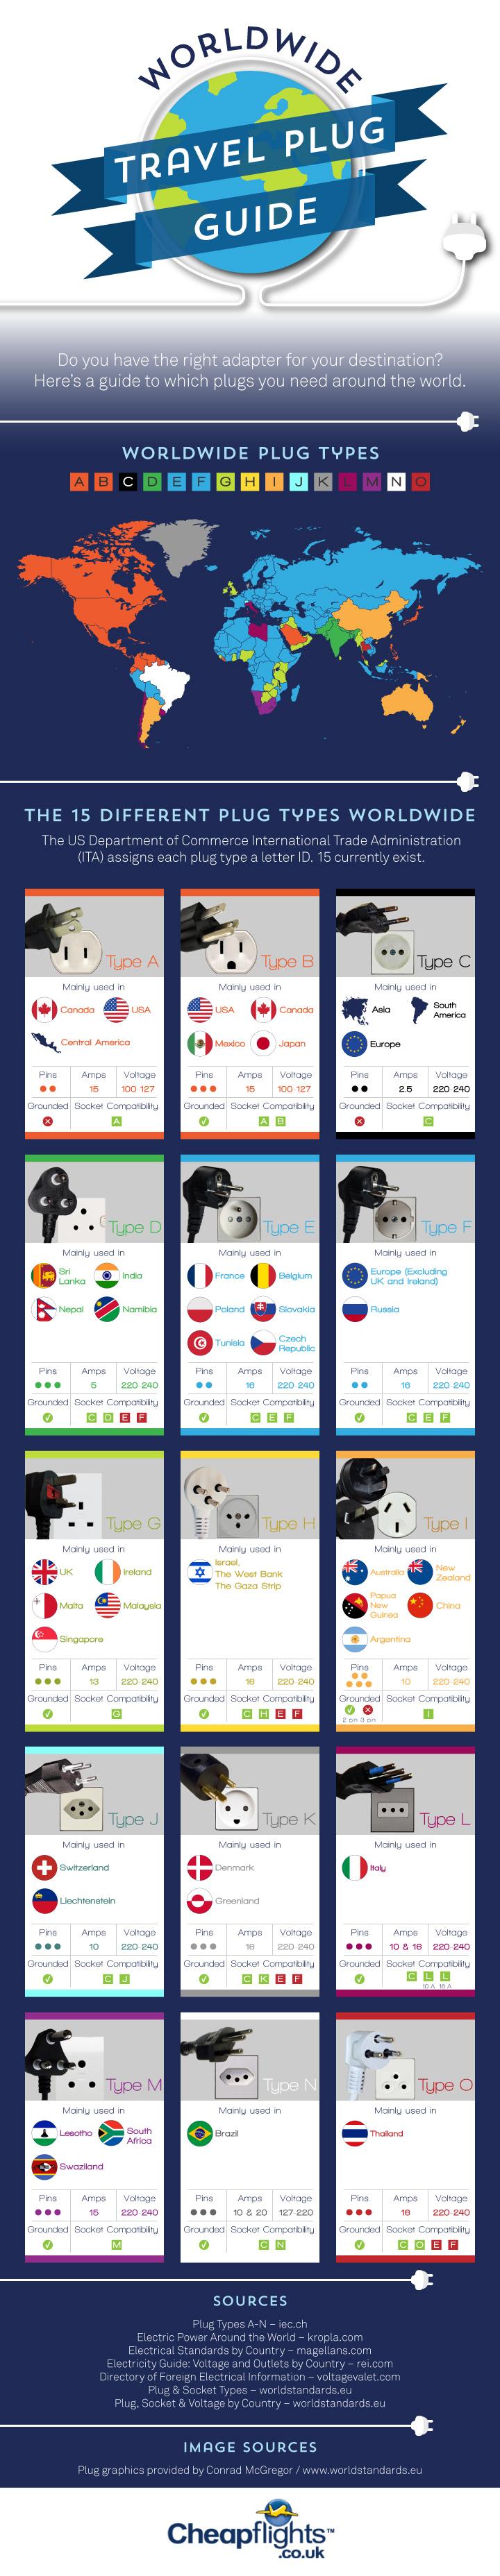 worldwide-travel-plug-guide-v3